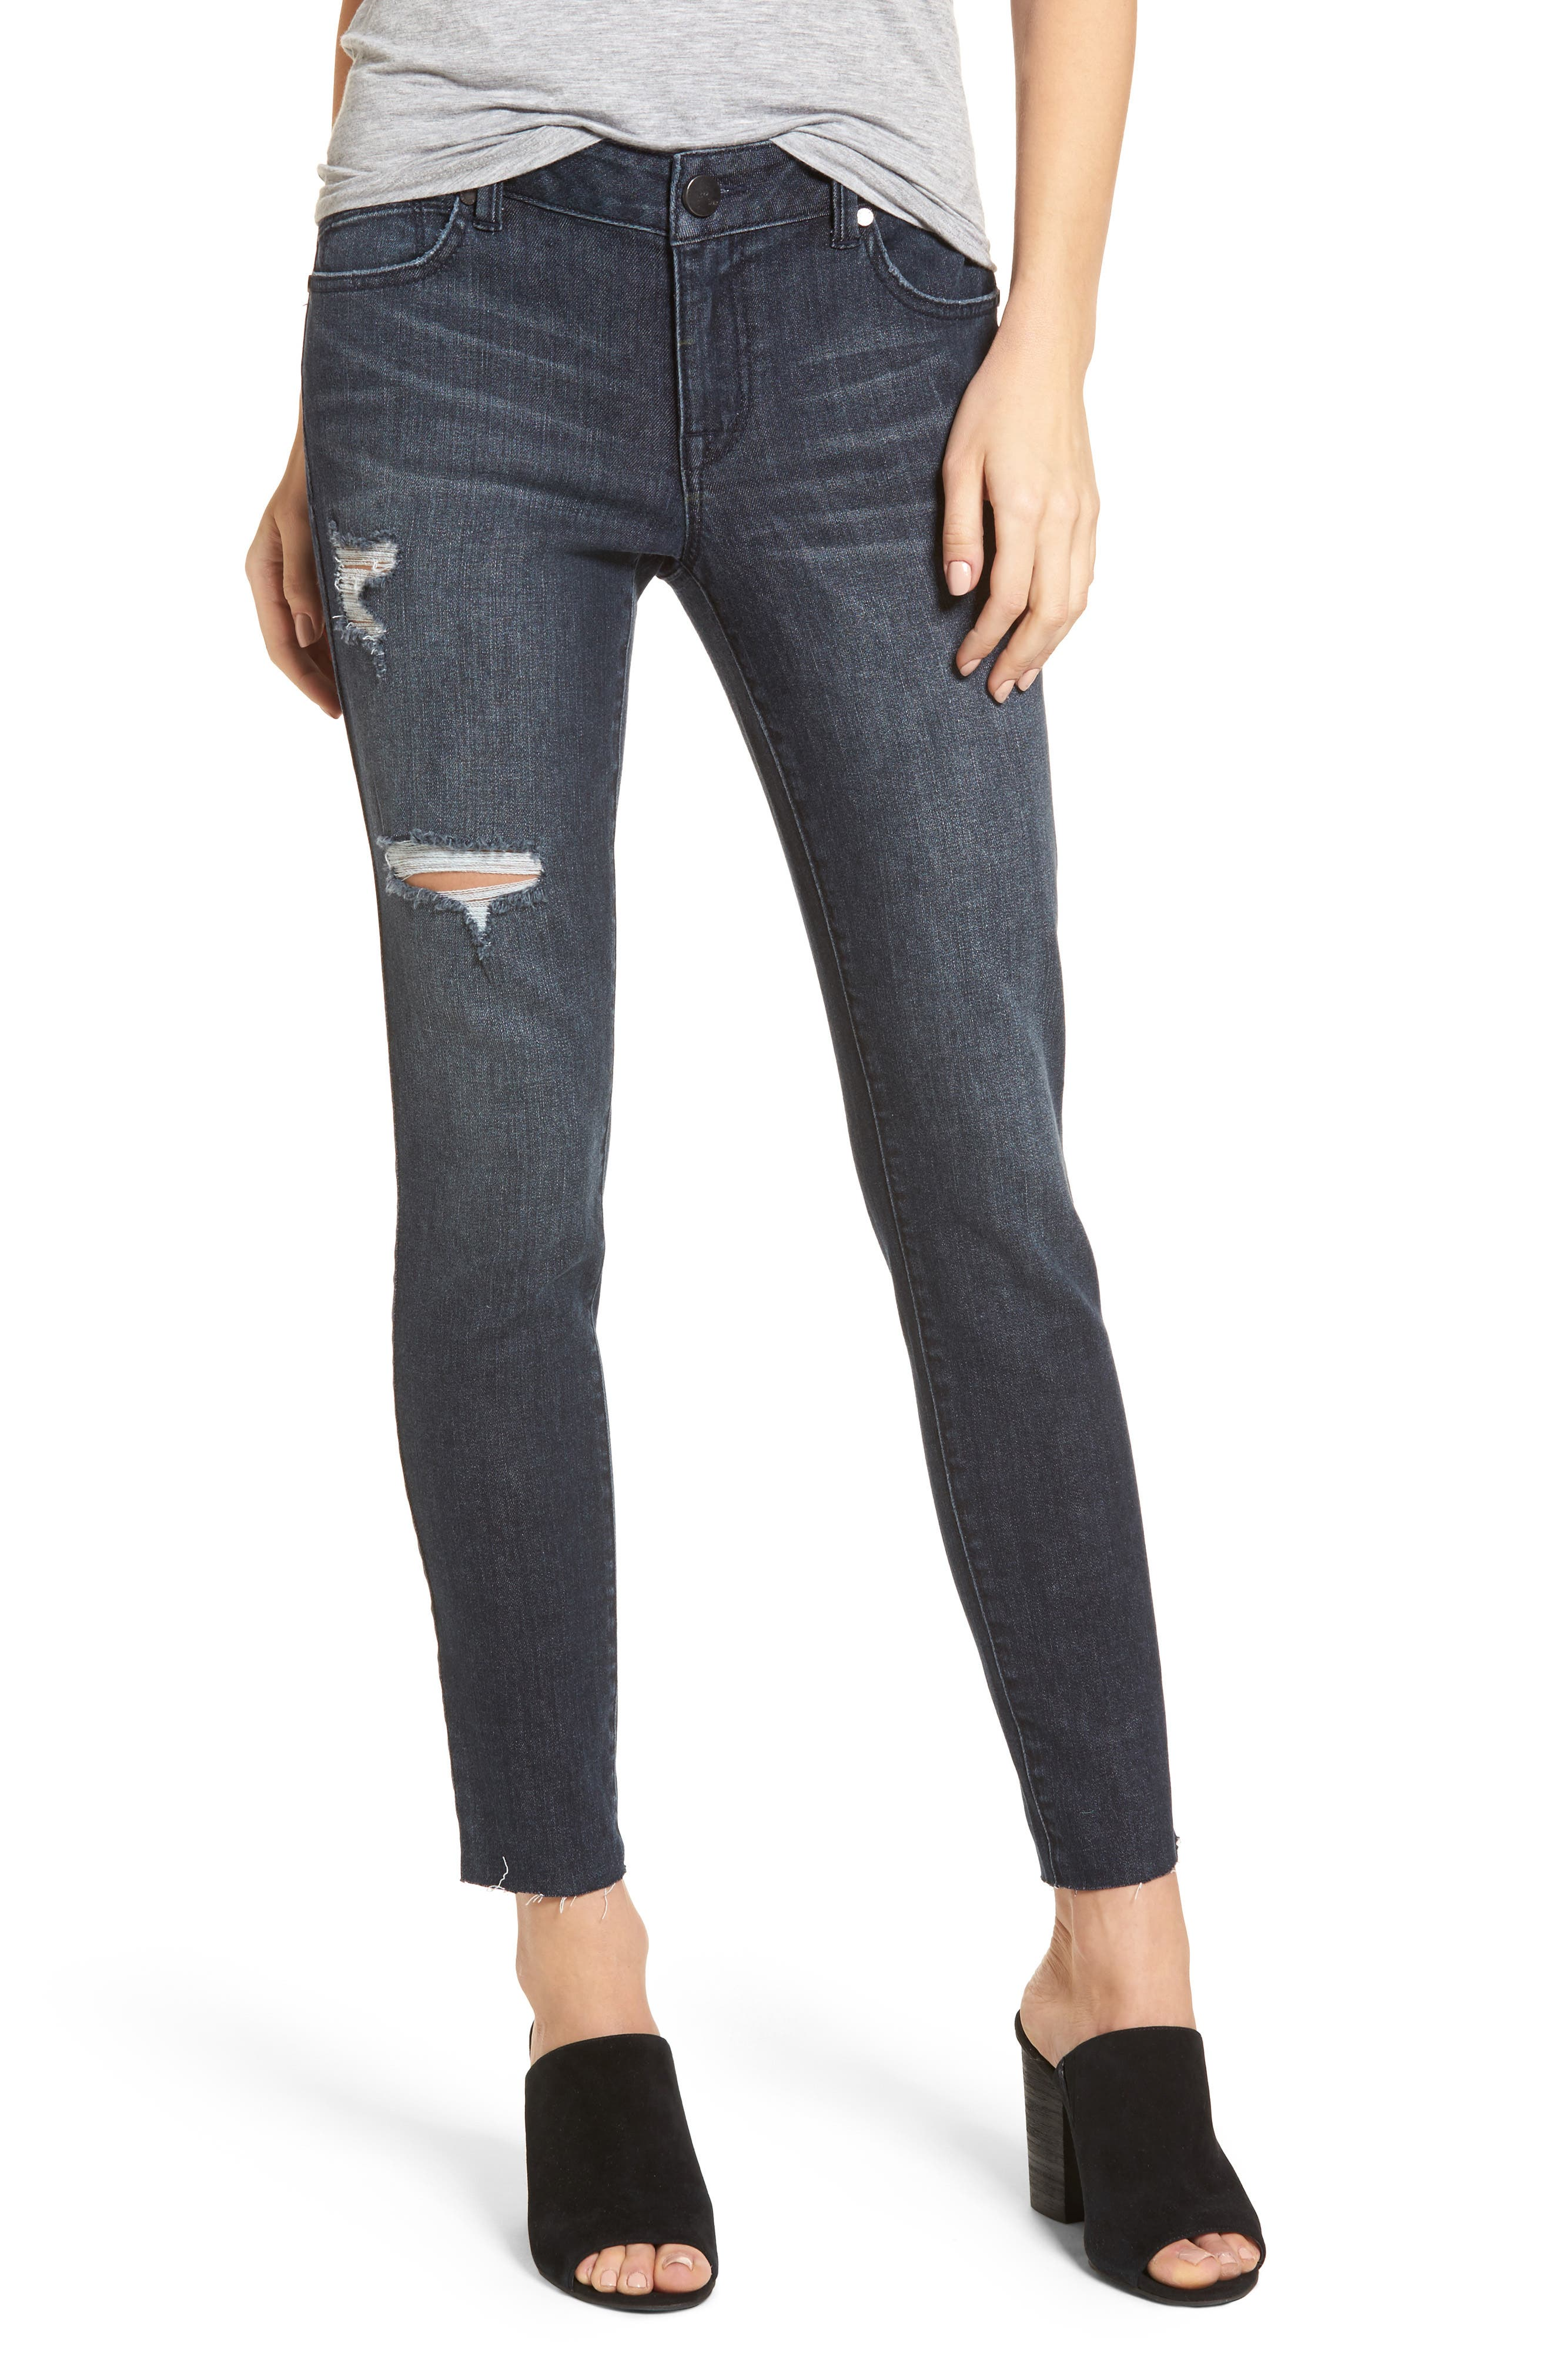 Main Image - 1822 Denim Distressed Skinny Jeans (Palin)